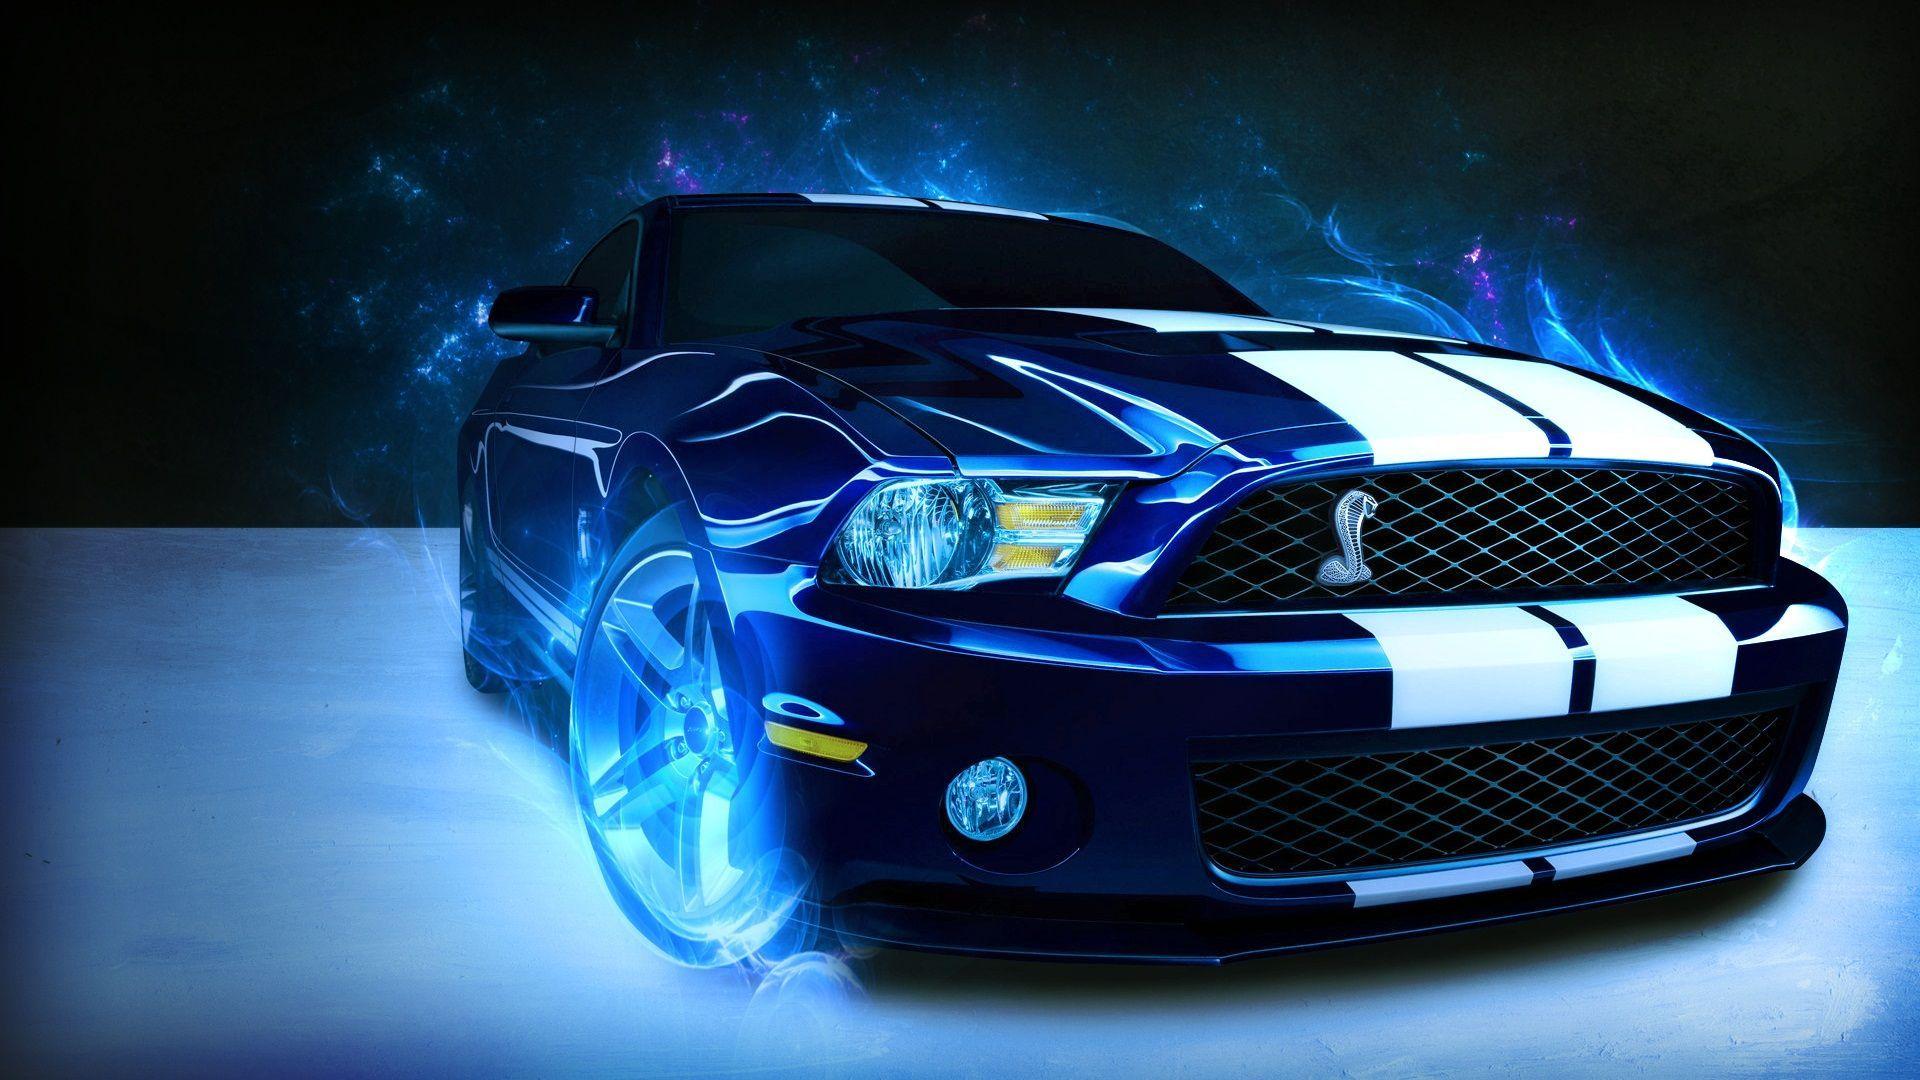 mustang car images